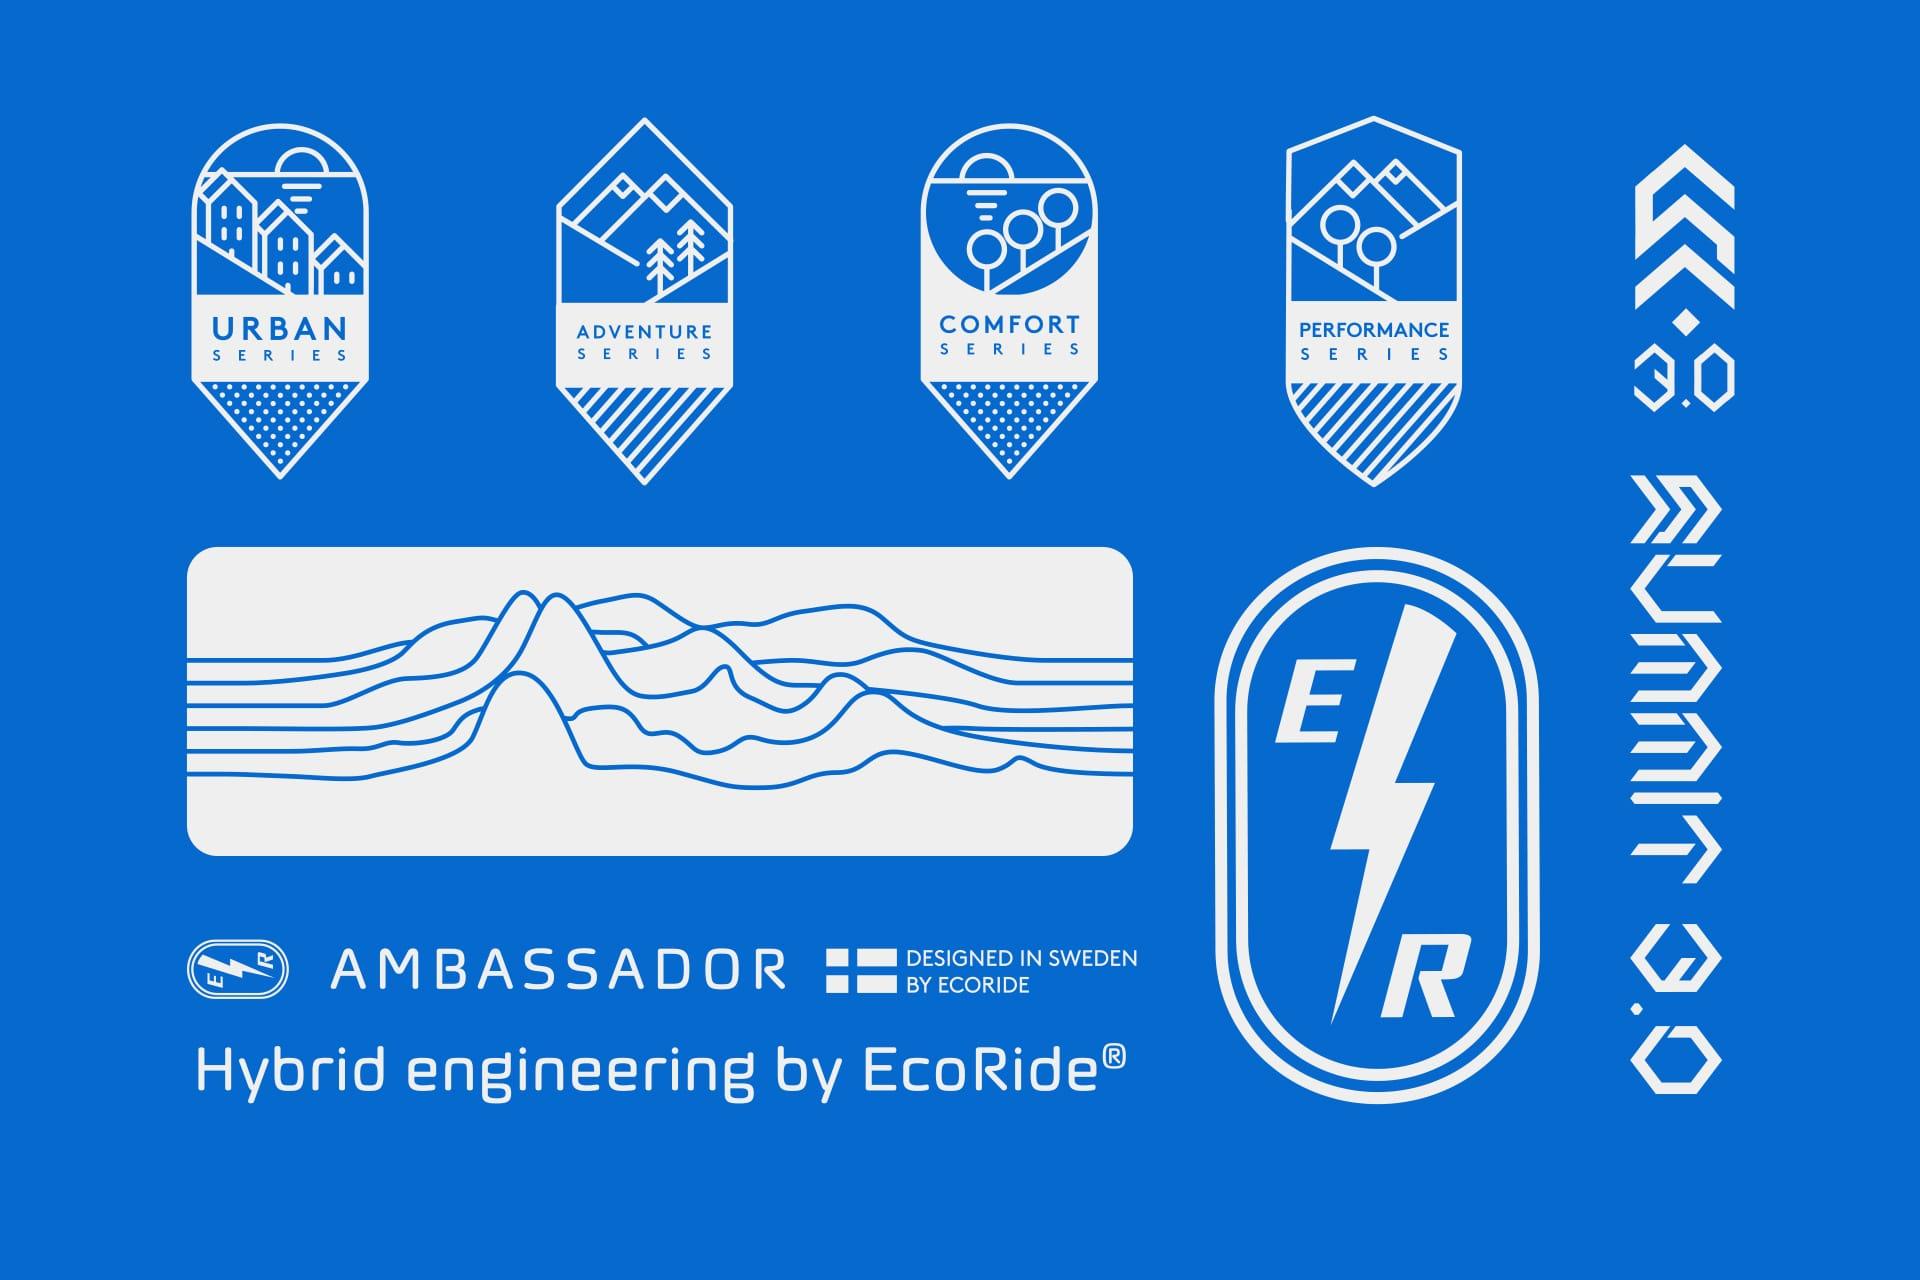 Ecoride_Produkt_Design_mnecander-1